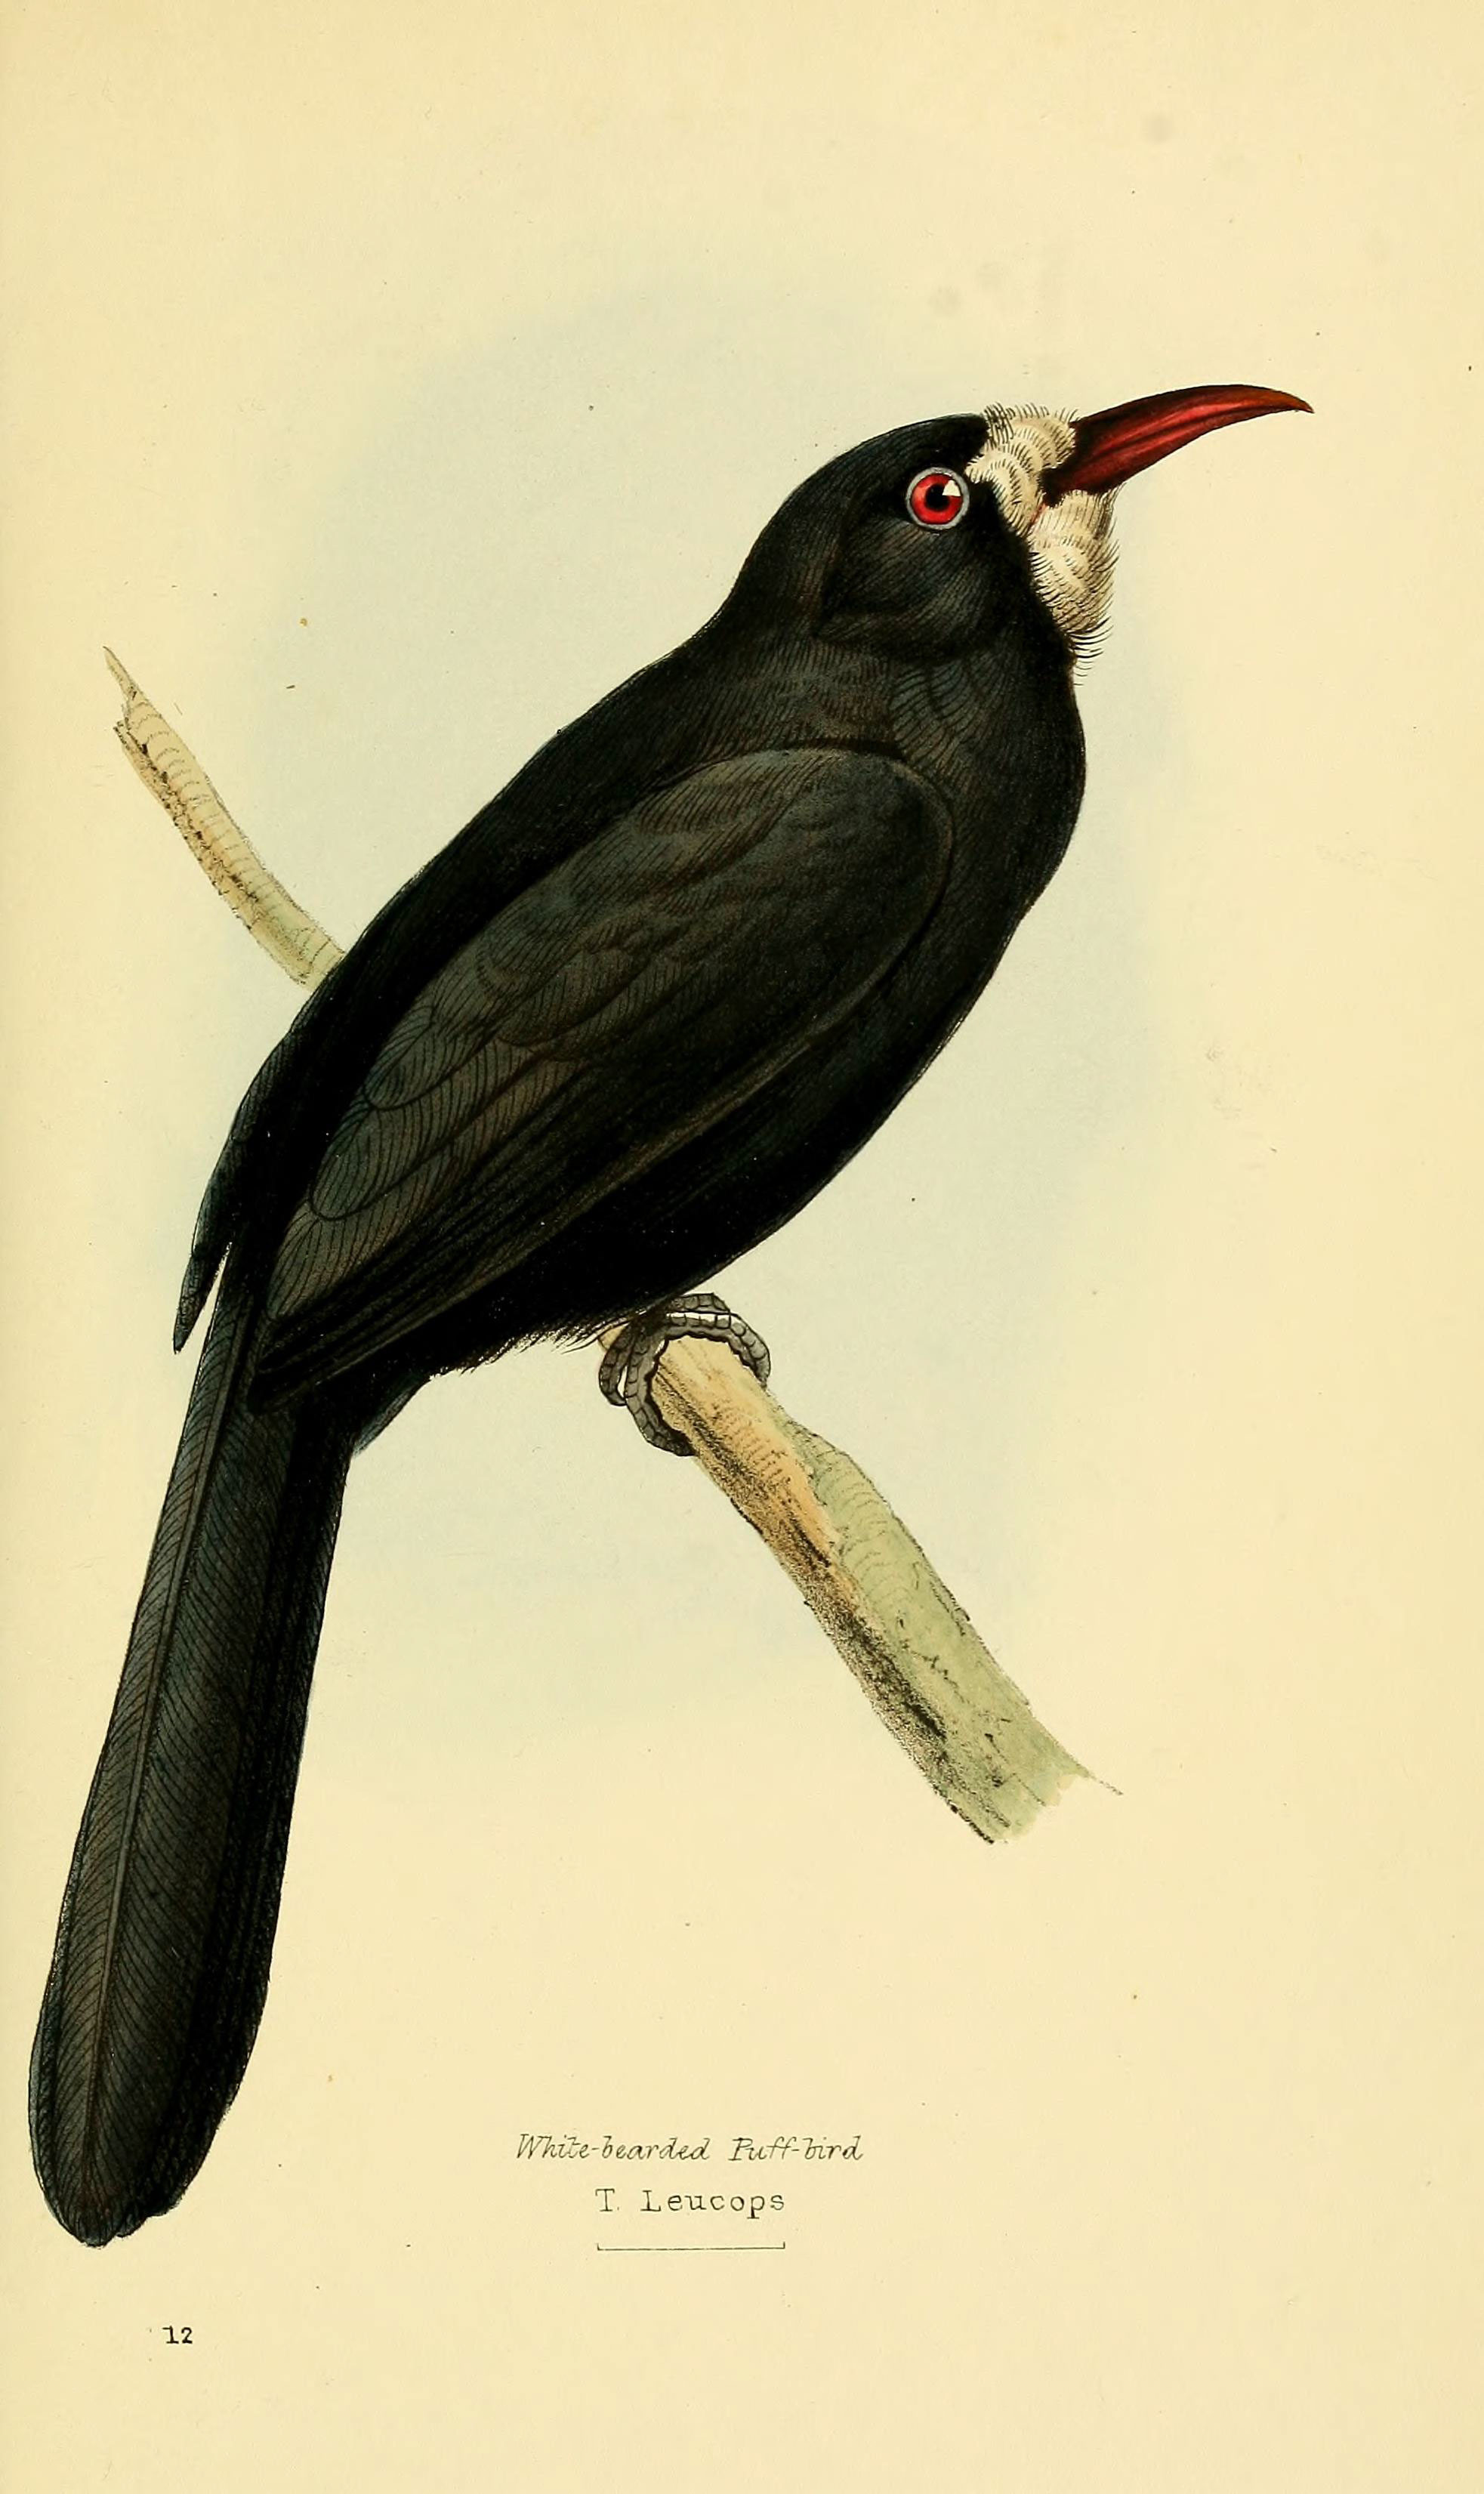 Image of White-fronted Nunbird